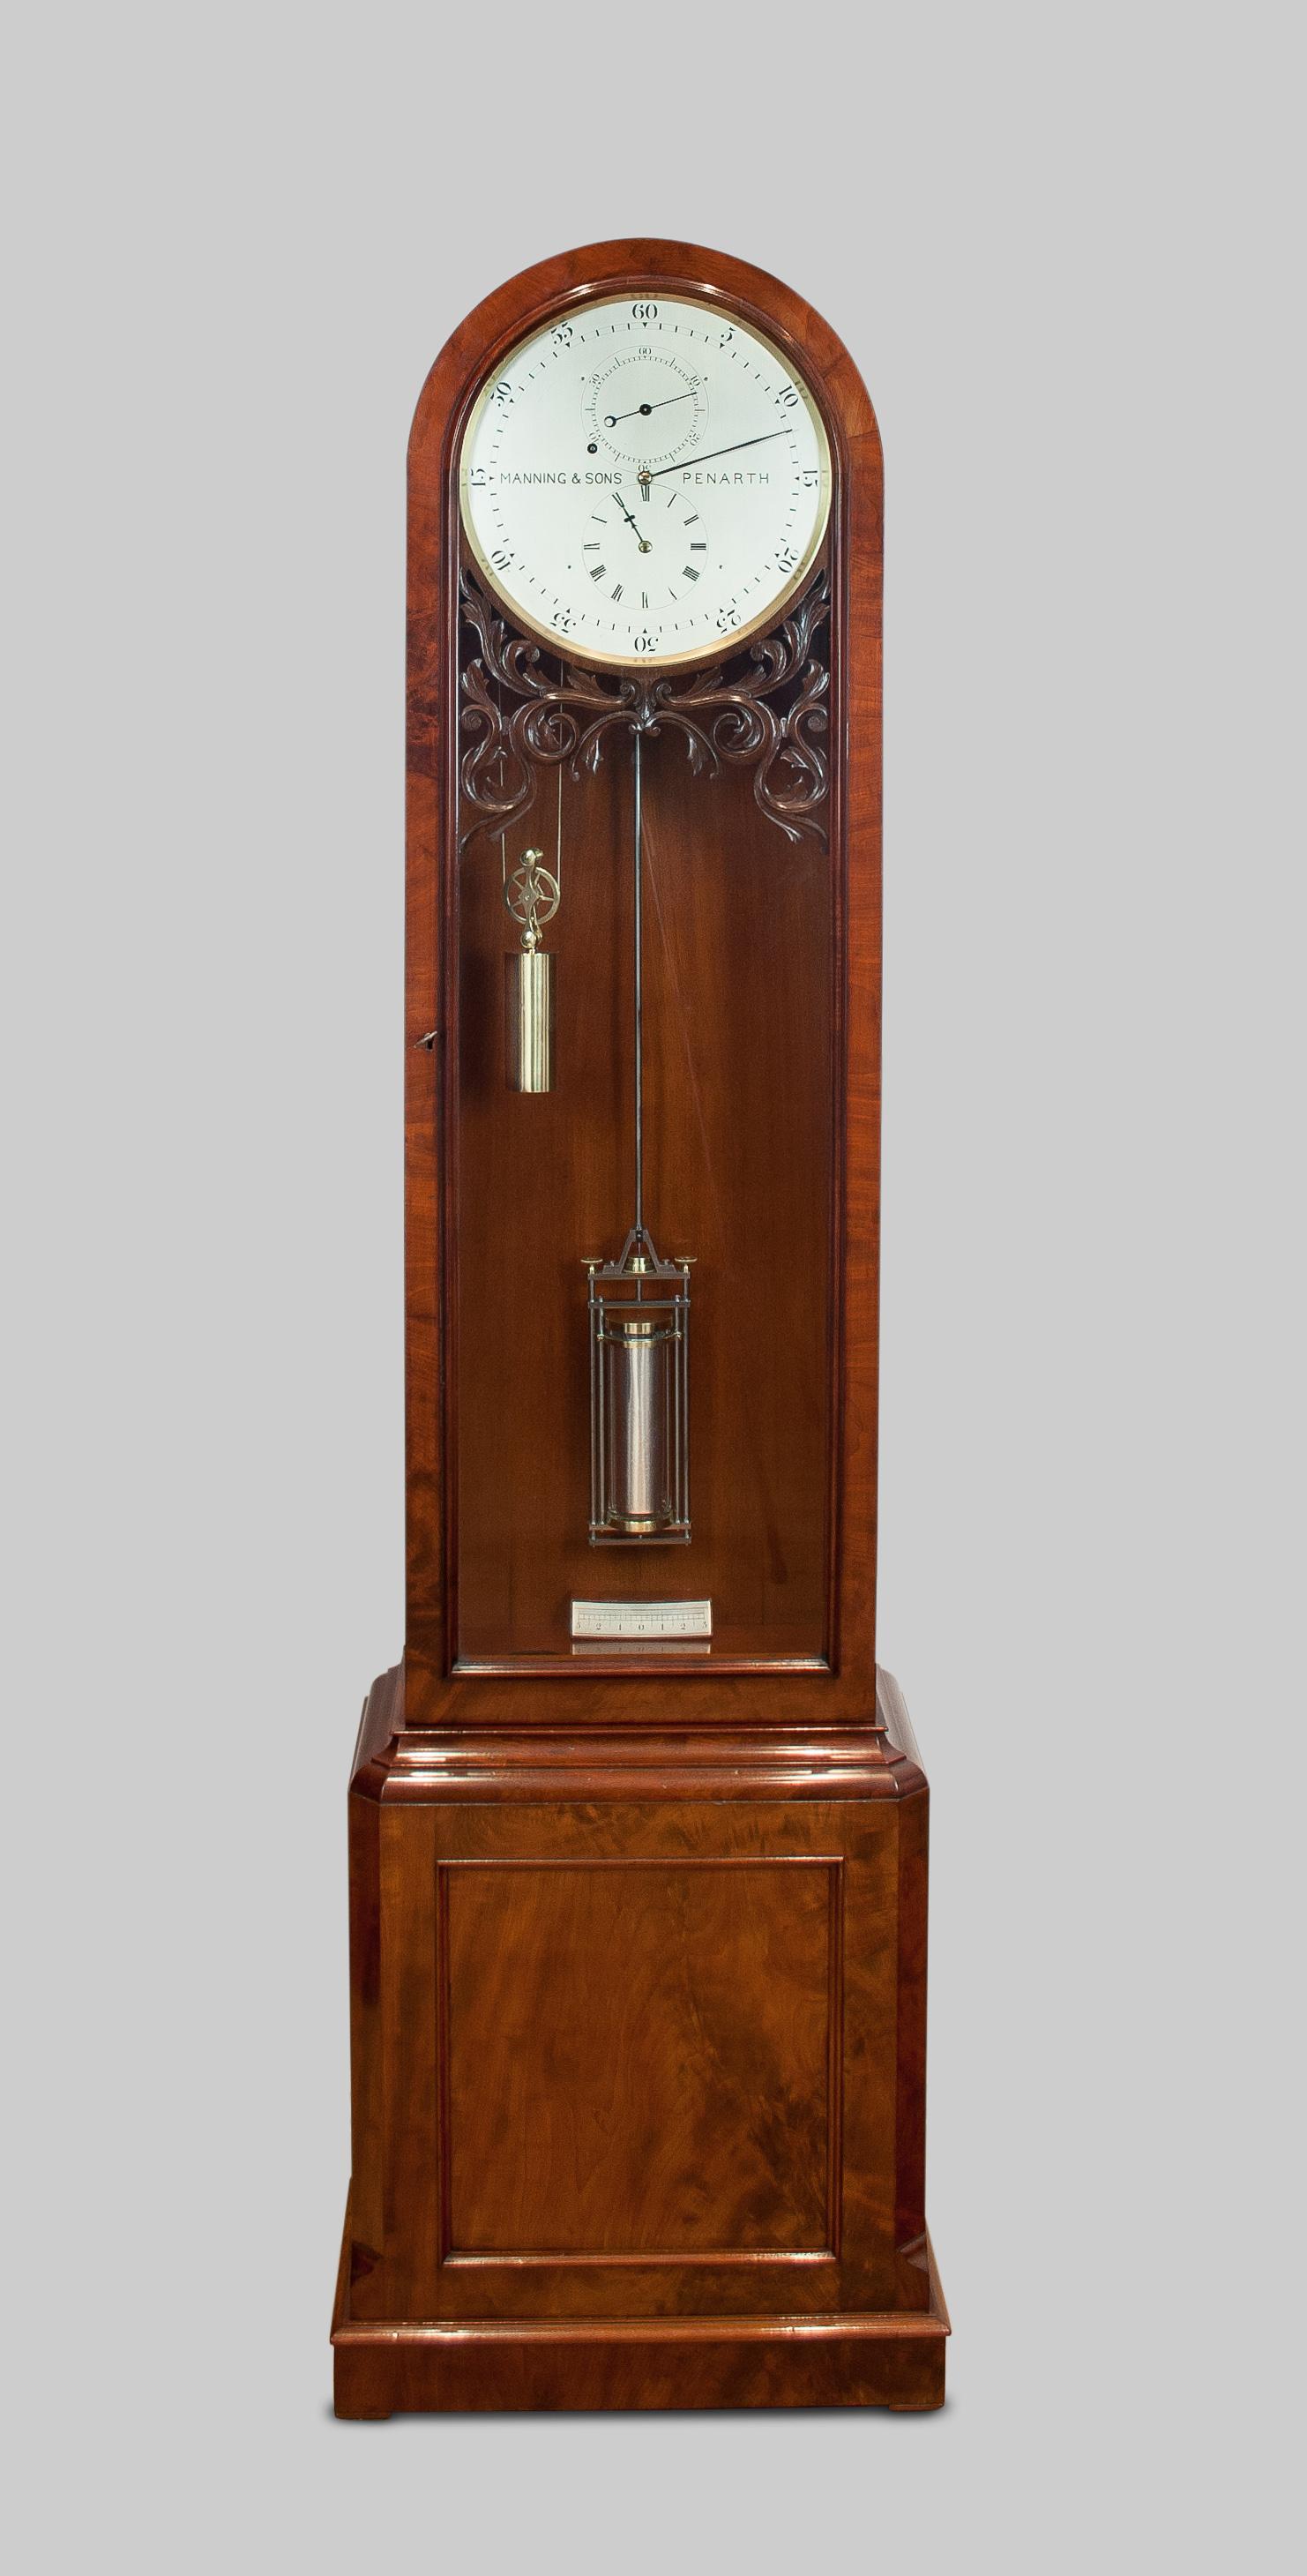 Story Antique Clocks image (8 of 11)